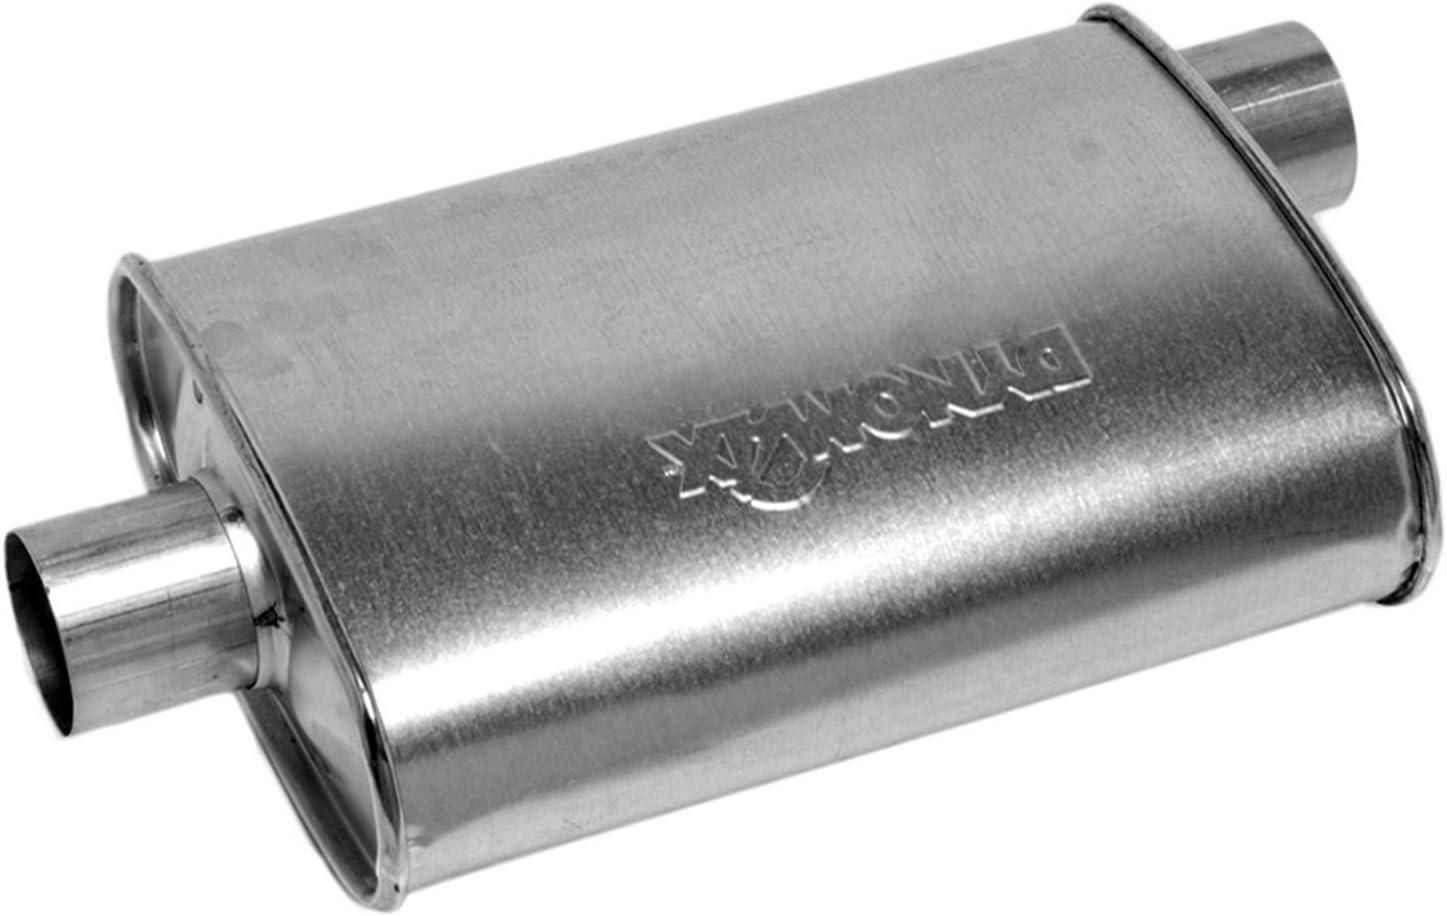 Dynomax 17736 Super Turbo Muffler